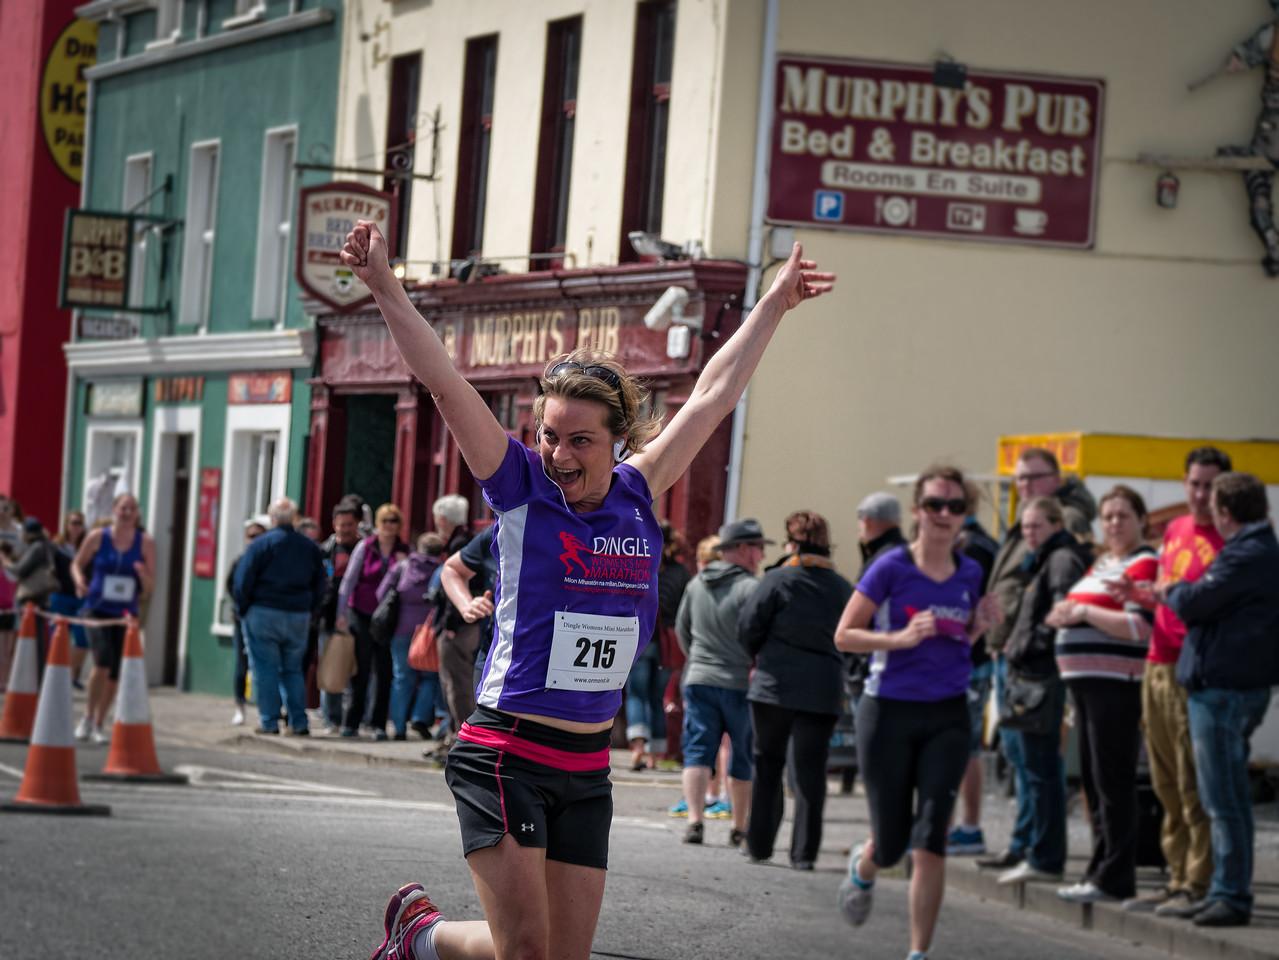 Delight at finishing the Women's Dingle marathon 2014